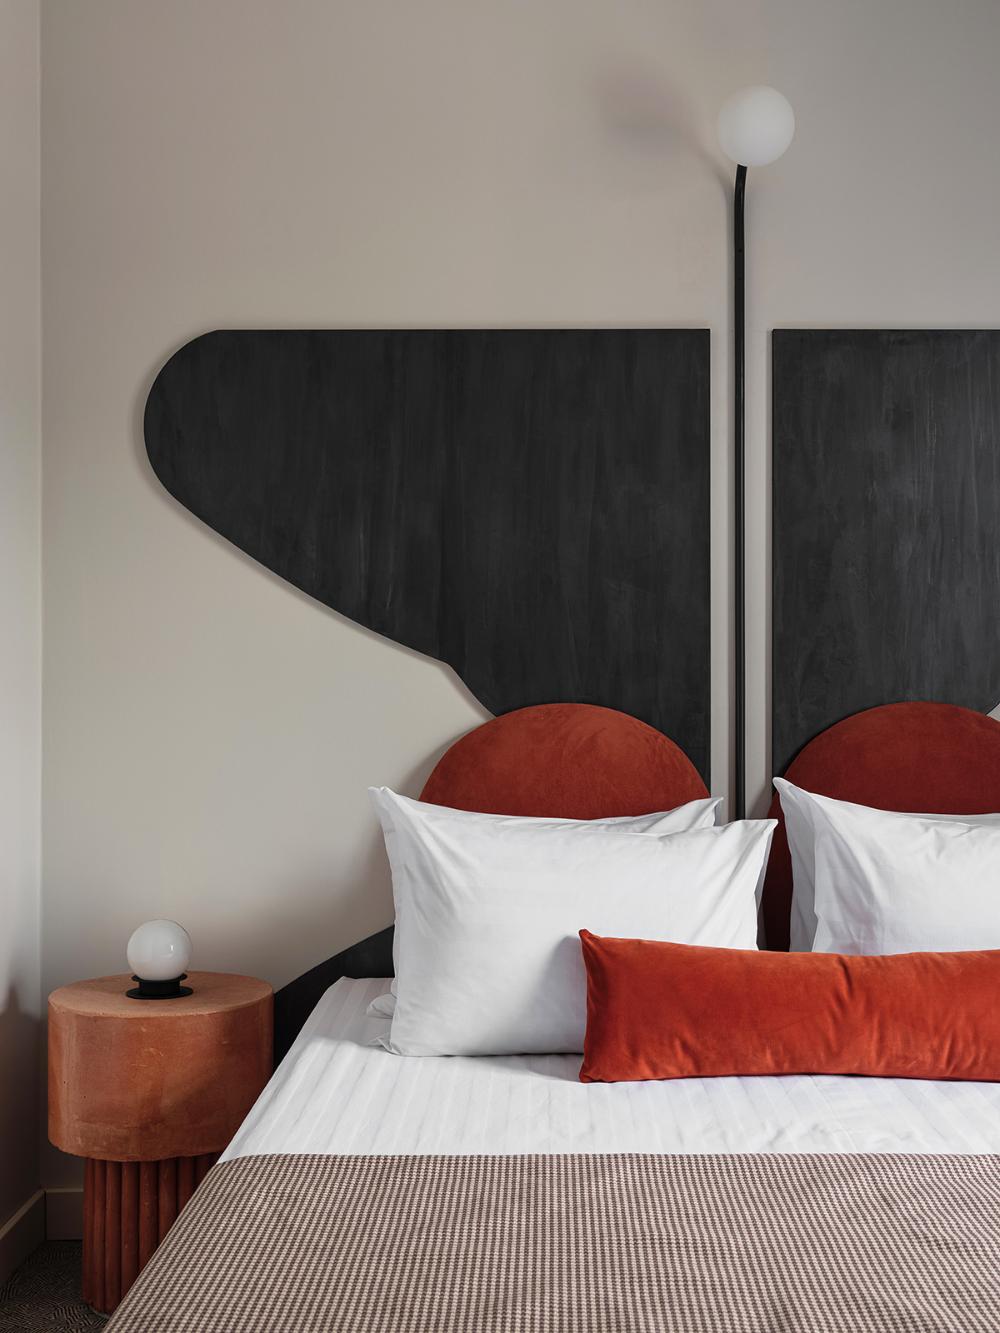 280 Interiors Bedroom Ideas In 2021 Interior Interior Design Bedroom Interior